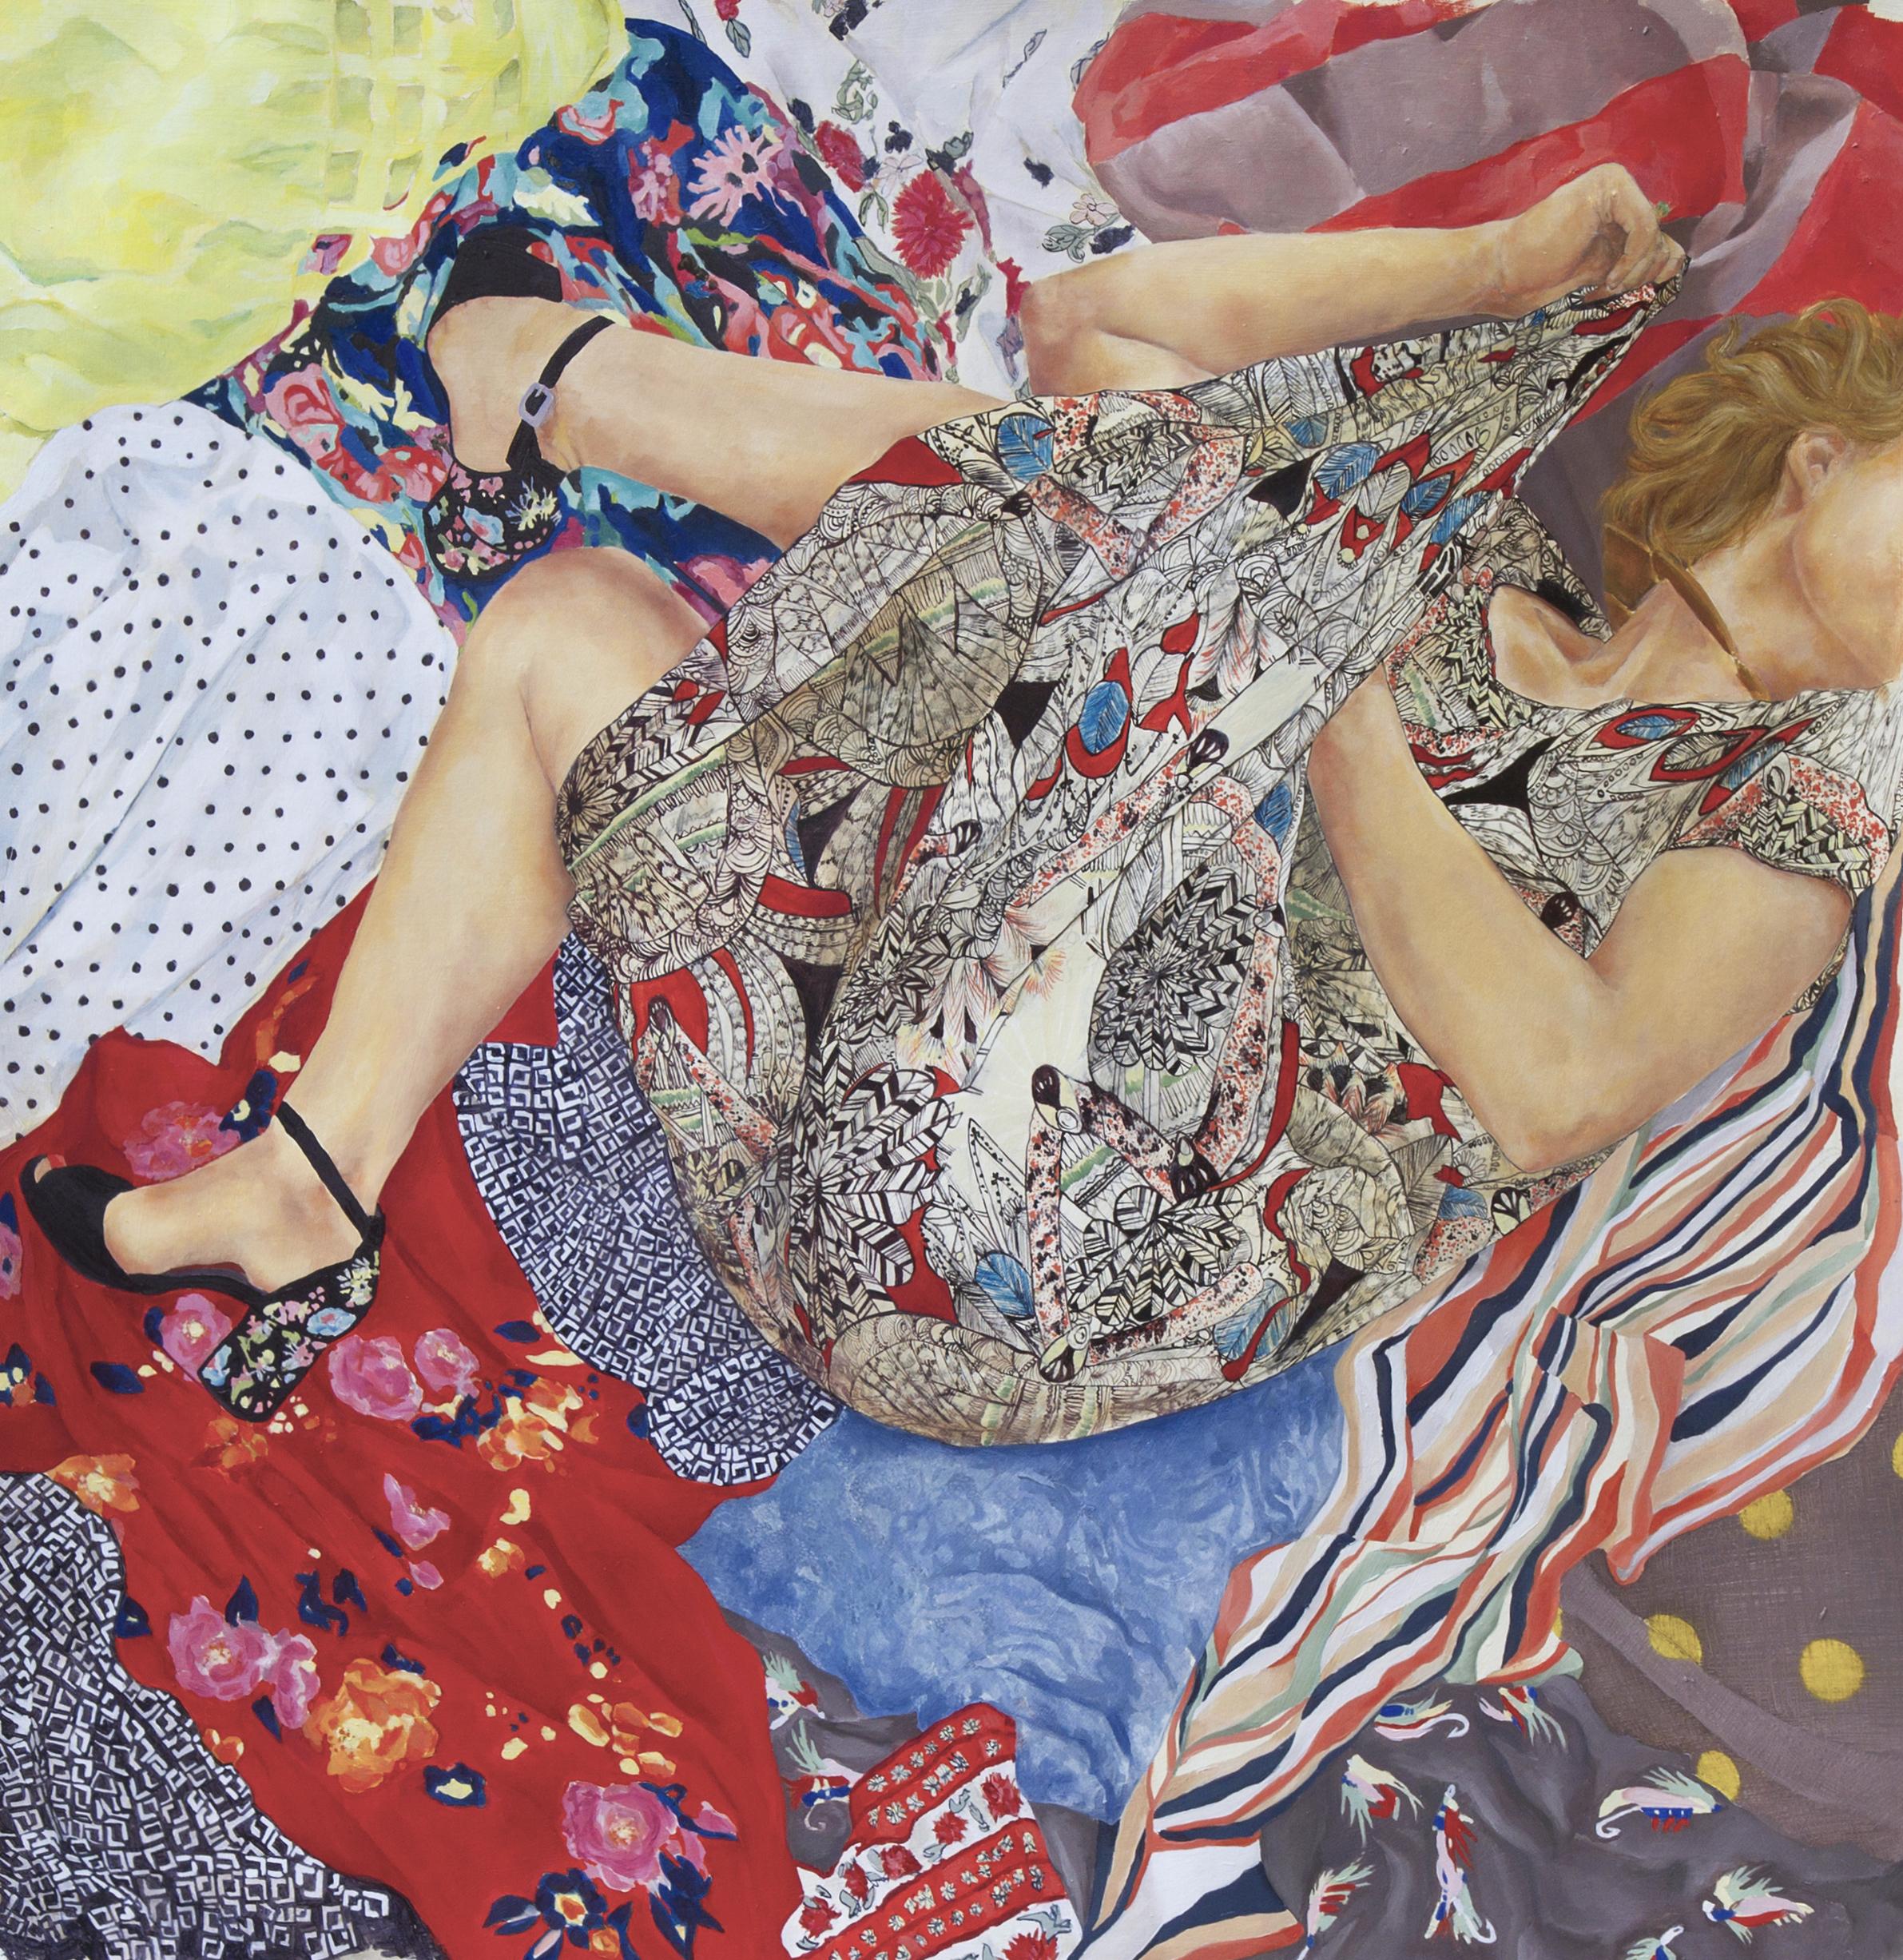 "Self Portrait Inspired by Kieta ft. All of My Patterns, Oil on Paper, 44x46"", 2017"